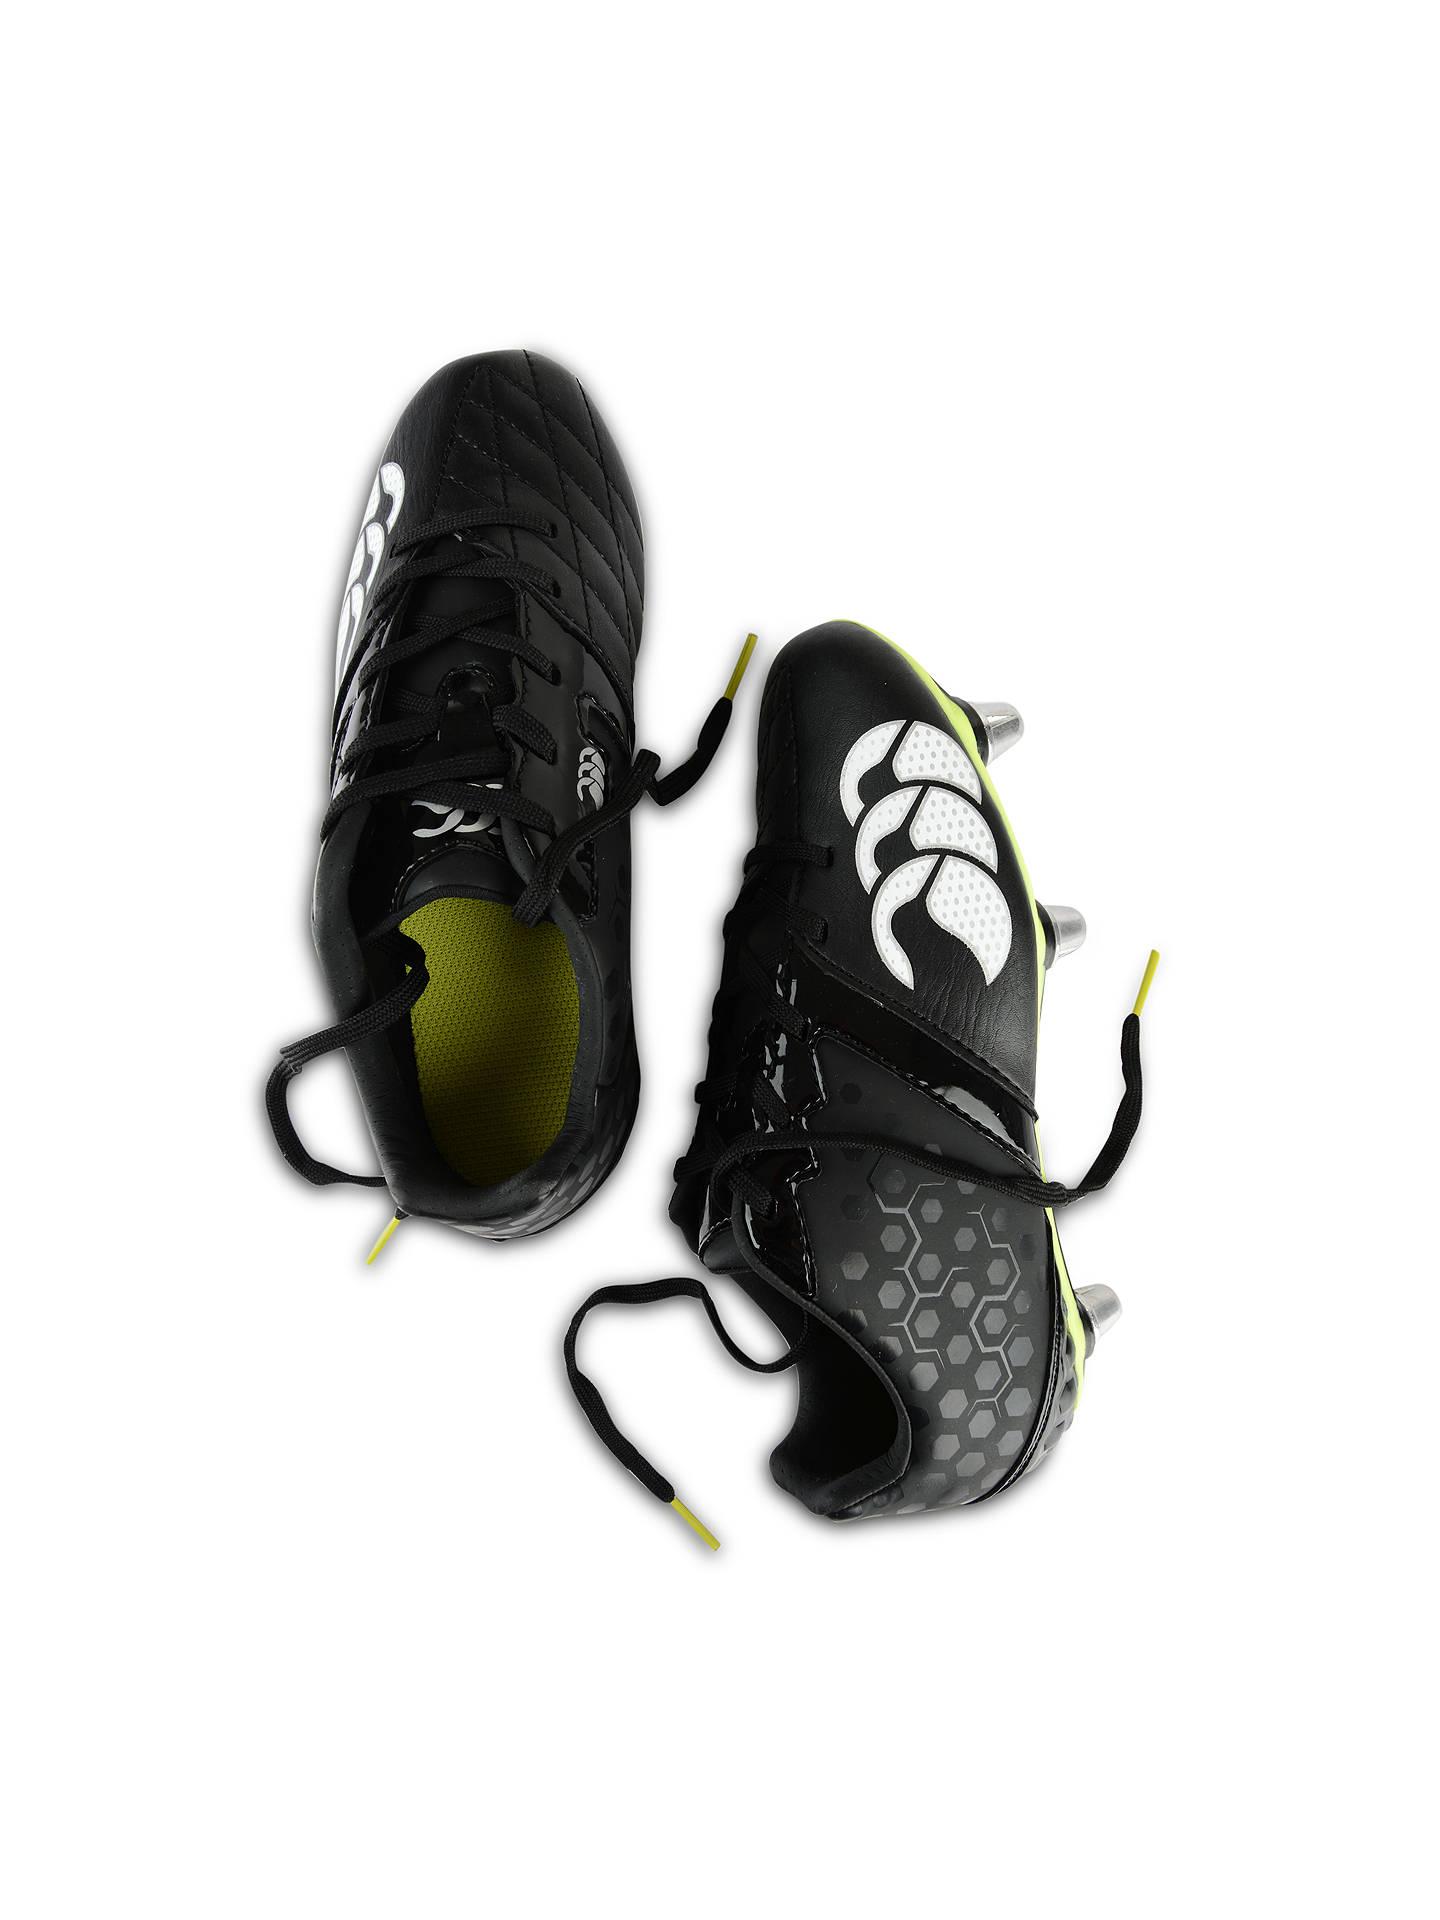 72f095889b47 ... Buy Canterbury of New Zealand Children's Phoenix Club 6 Stud Football  Boots, Black, 13